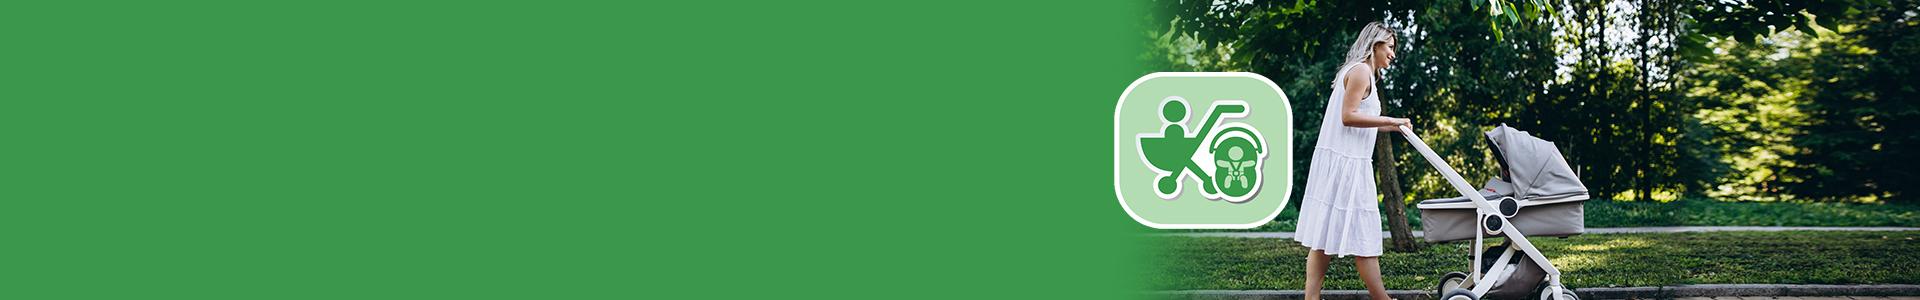 Kengur nosiljka